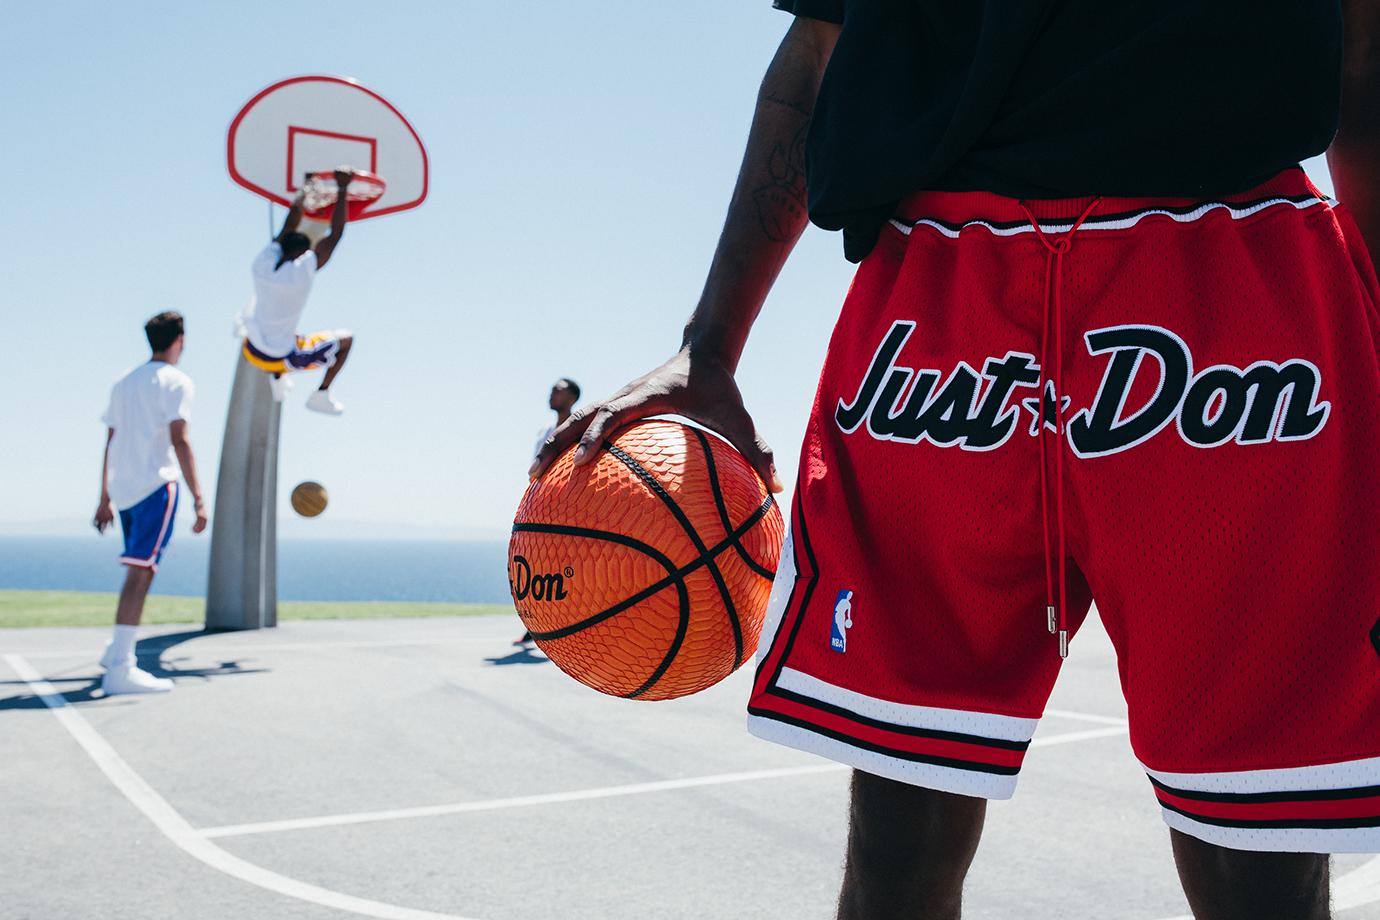 Just Don 2015 Summer Basketball Shorts Lookbook